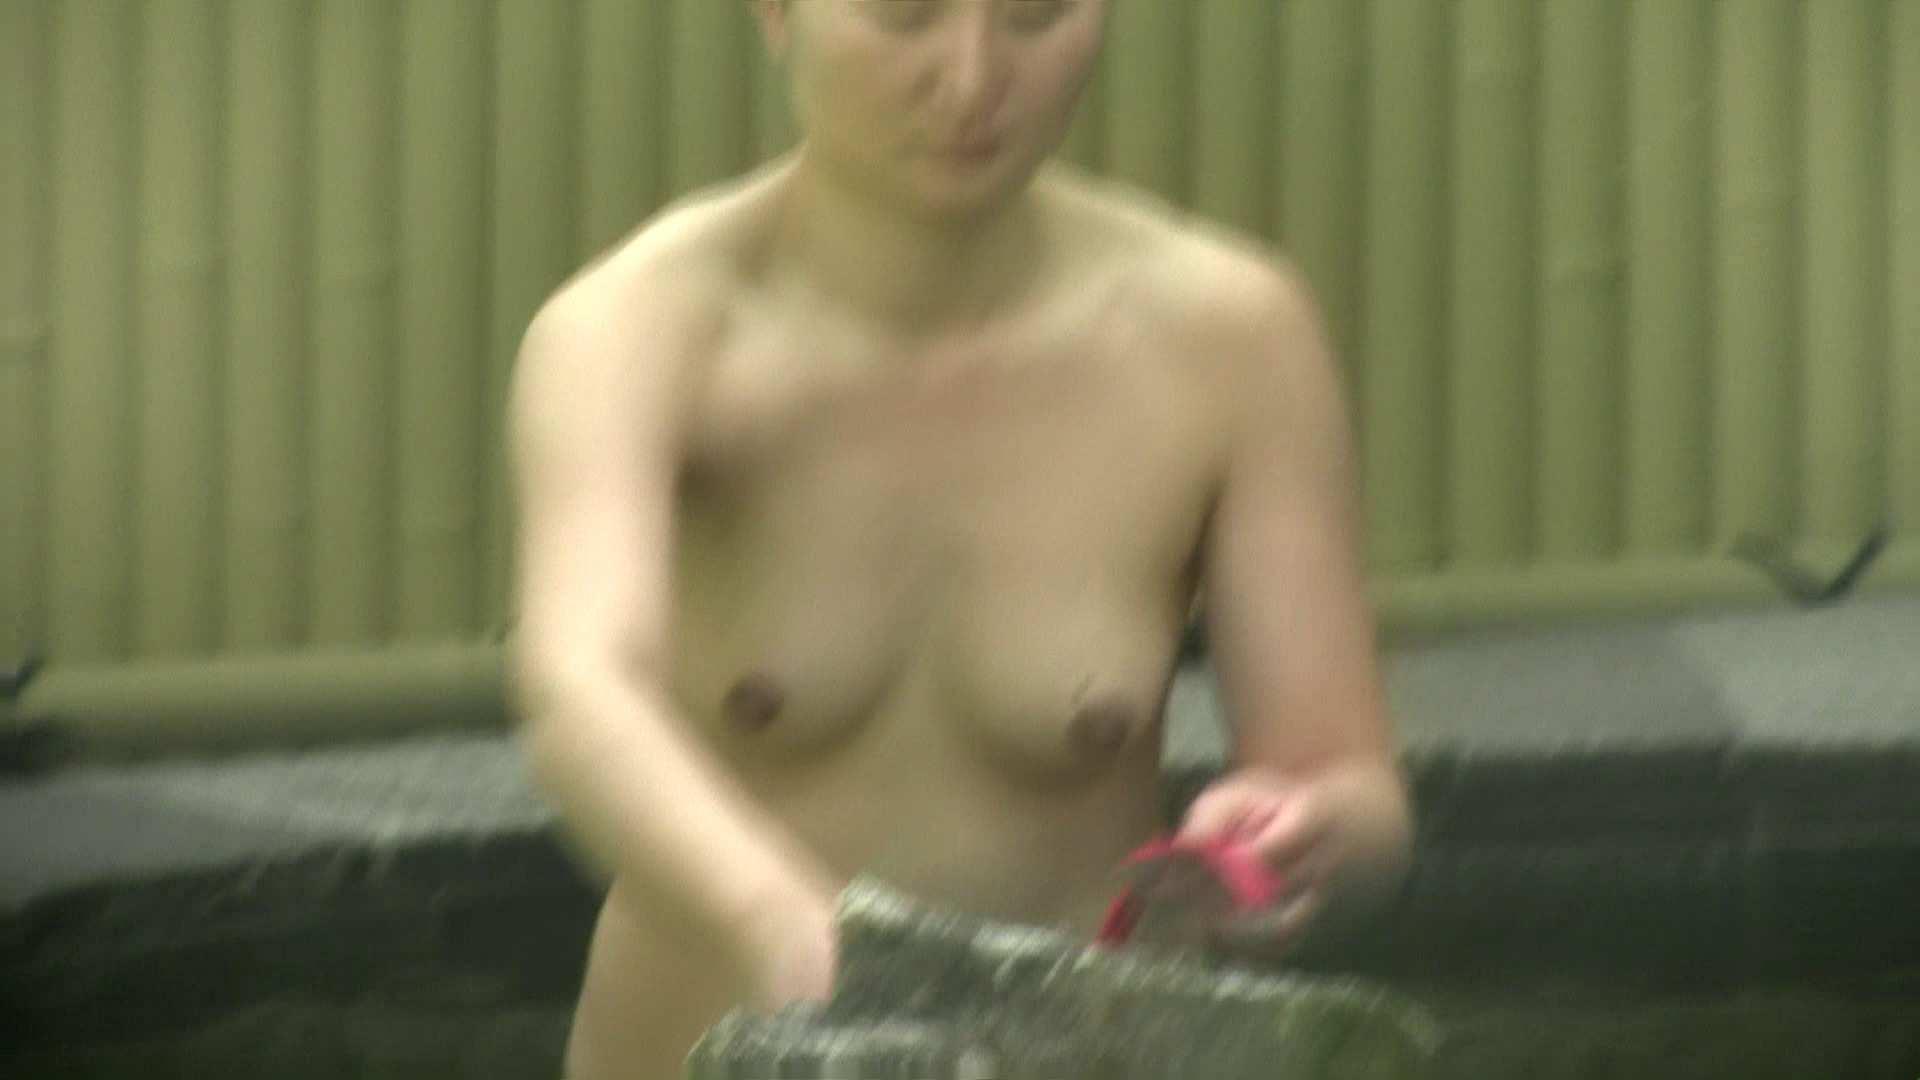 Aquaな露天風呂Vol.632 盗撮 | OLエロ画像  41PICs 1